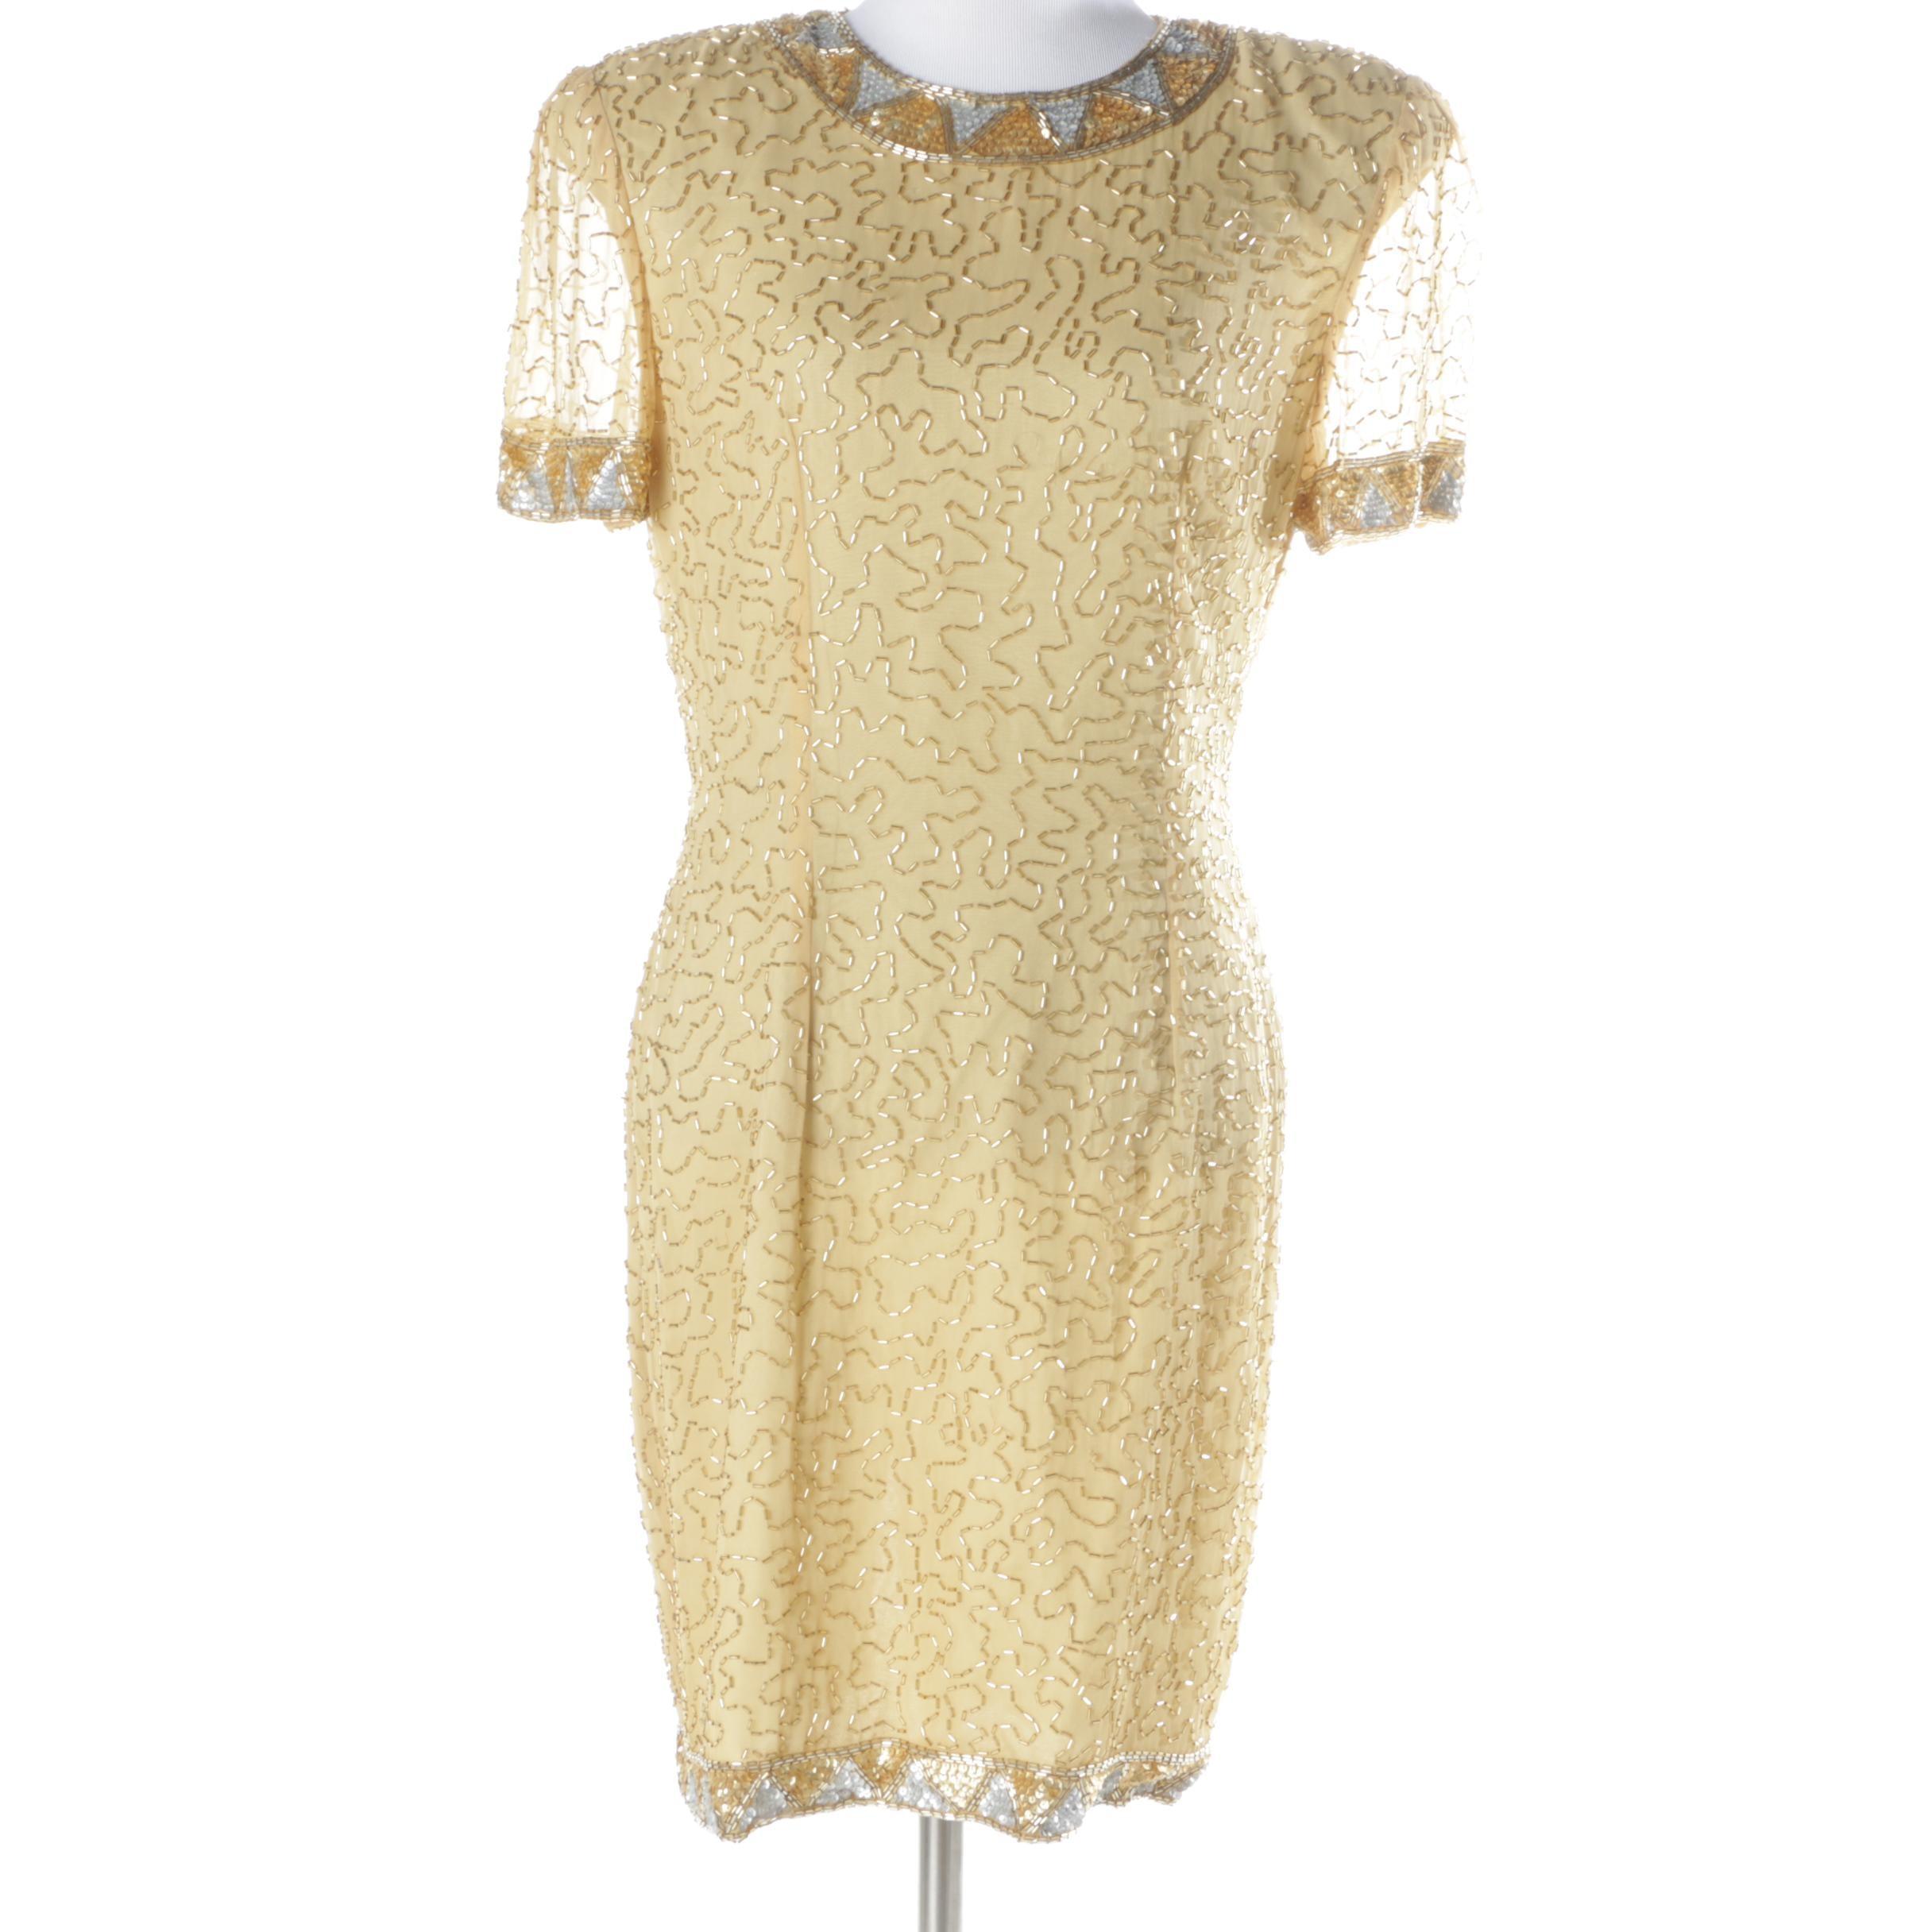 Women's A.J. Bari Beaded Cocktail Dress